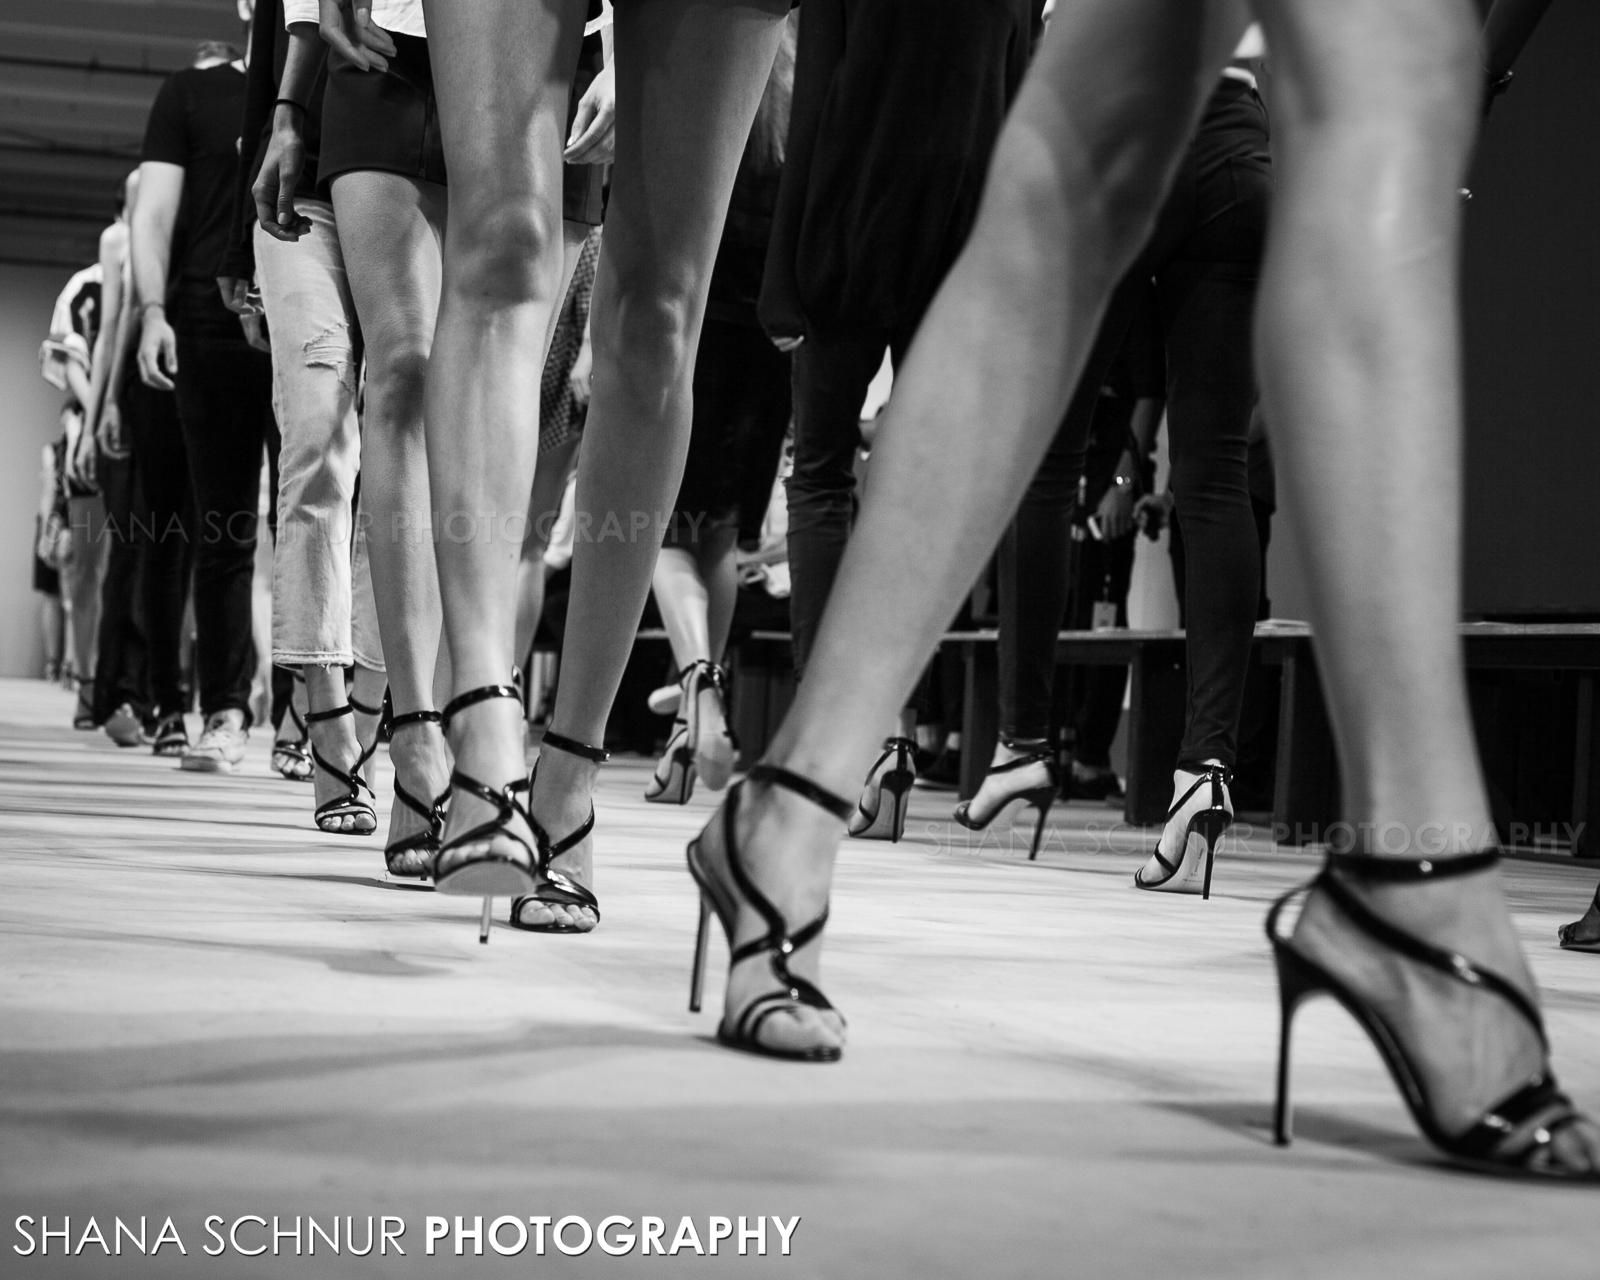 JMendel-Shana-Schnur-Photography--014.jpg